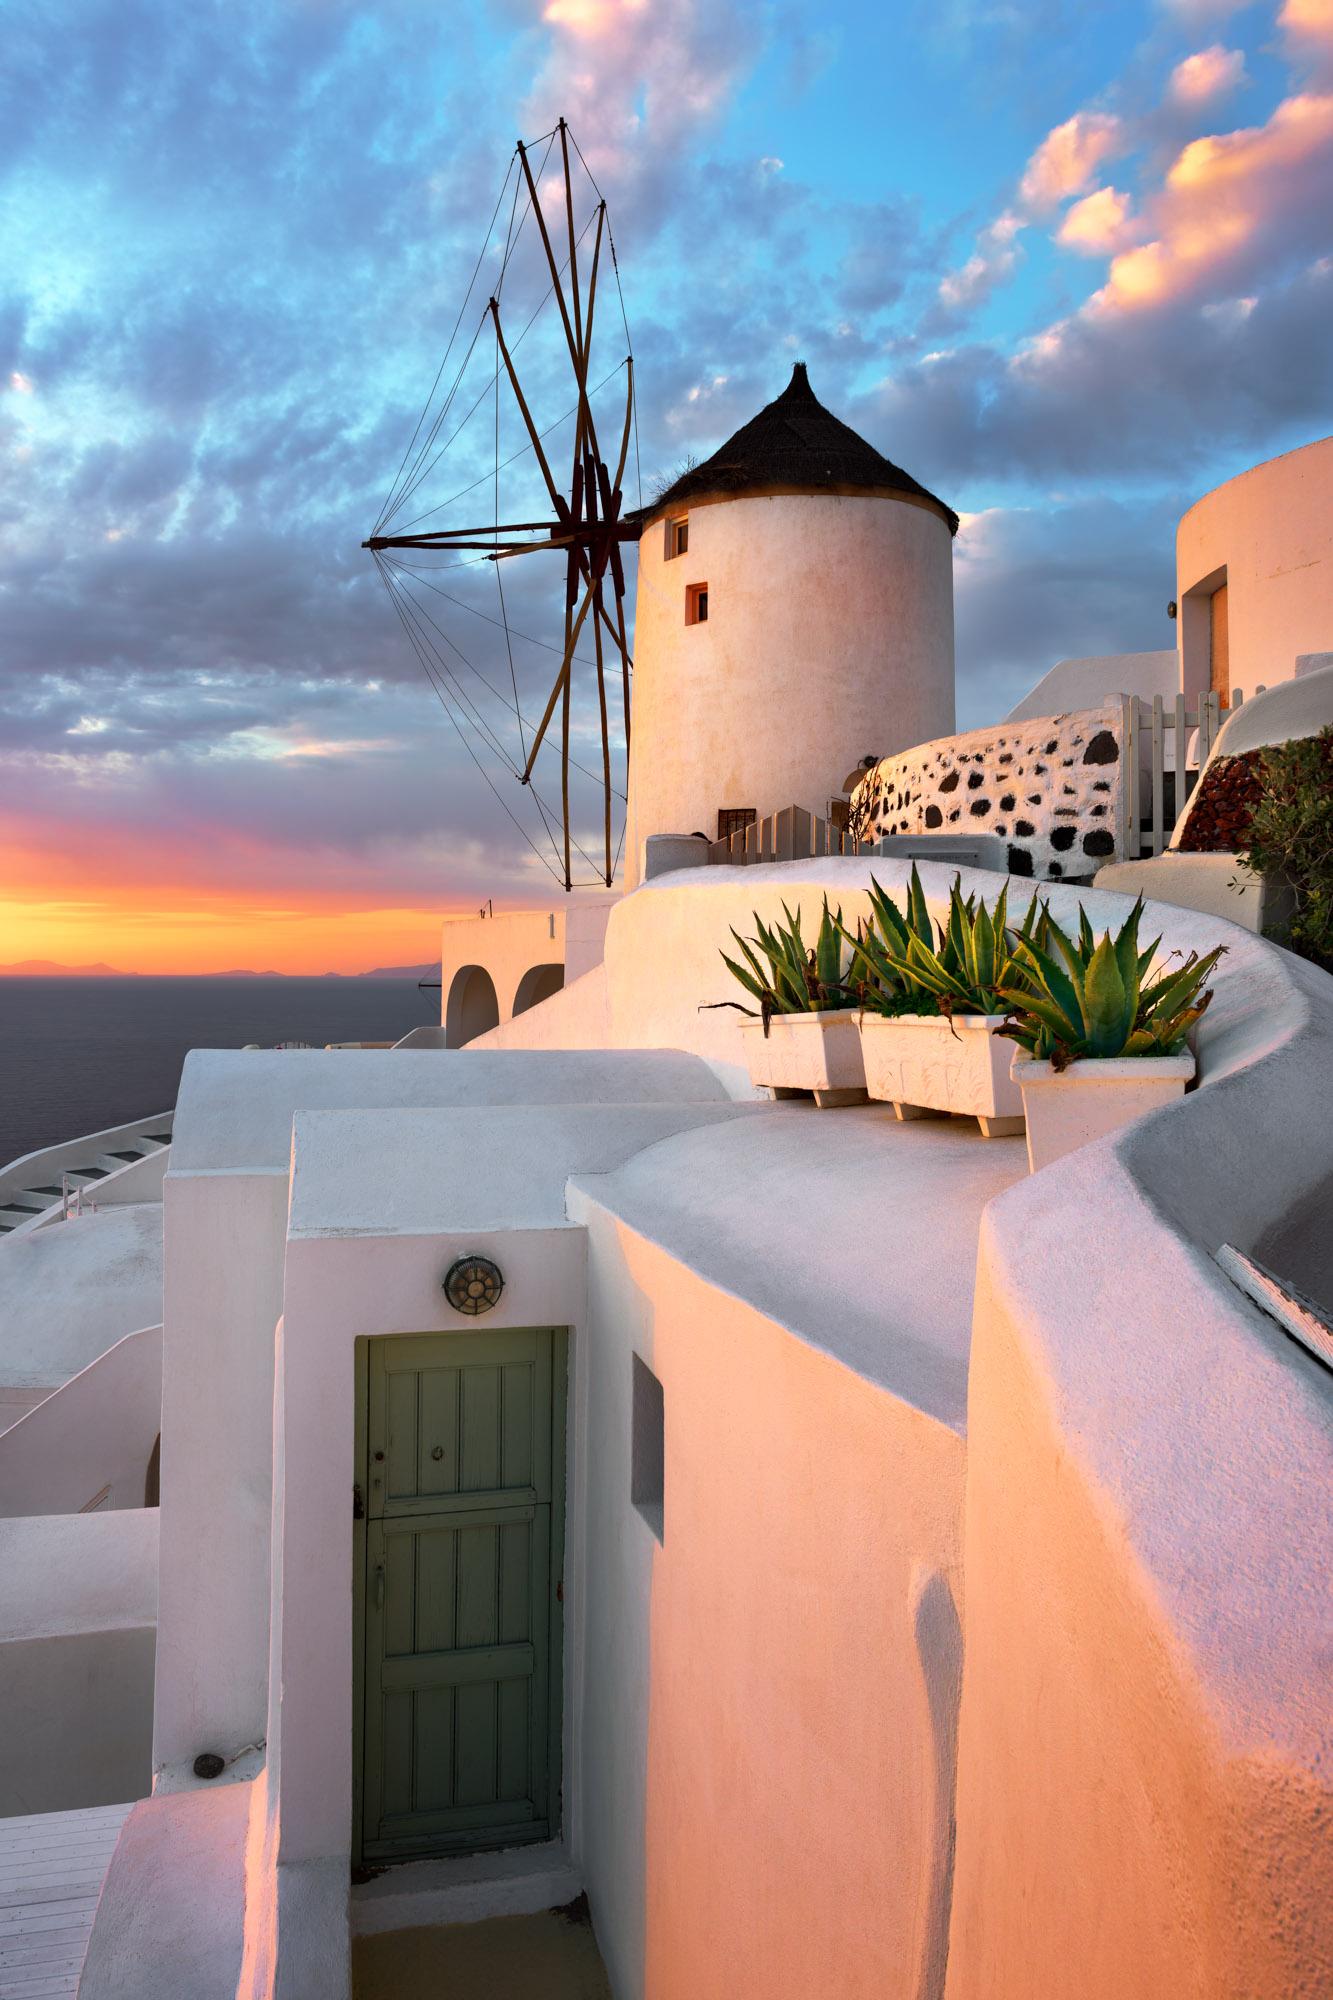 Windmill, Oia Village, Santorini, Greece